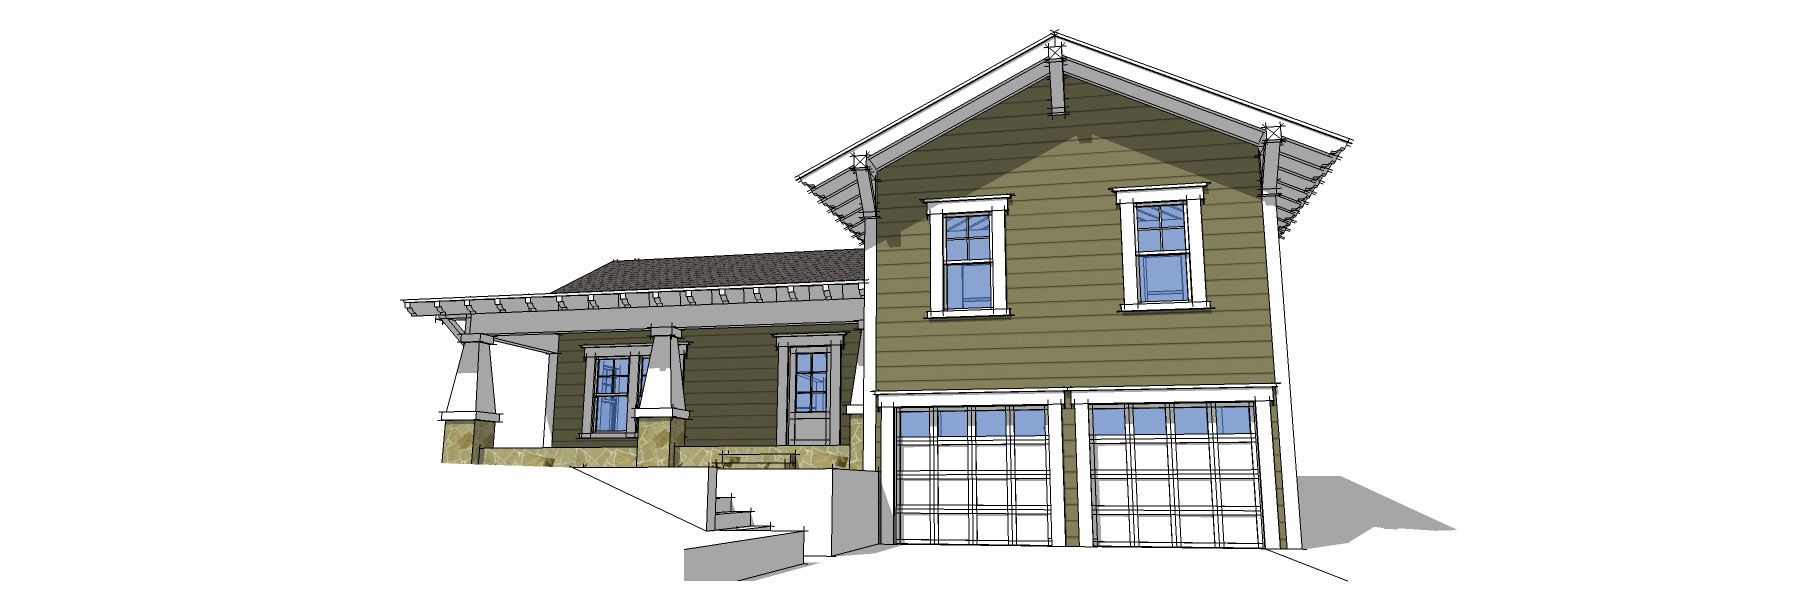 split-level house-plan idea | Home Styles | Pinterest | Roof ...